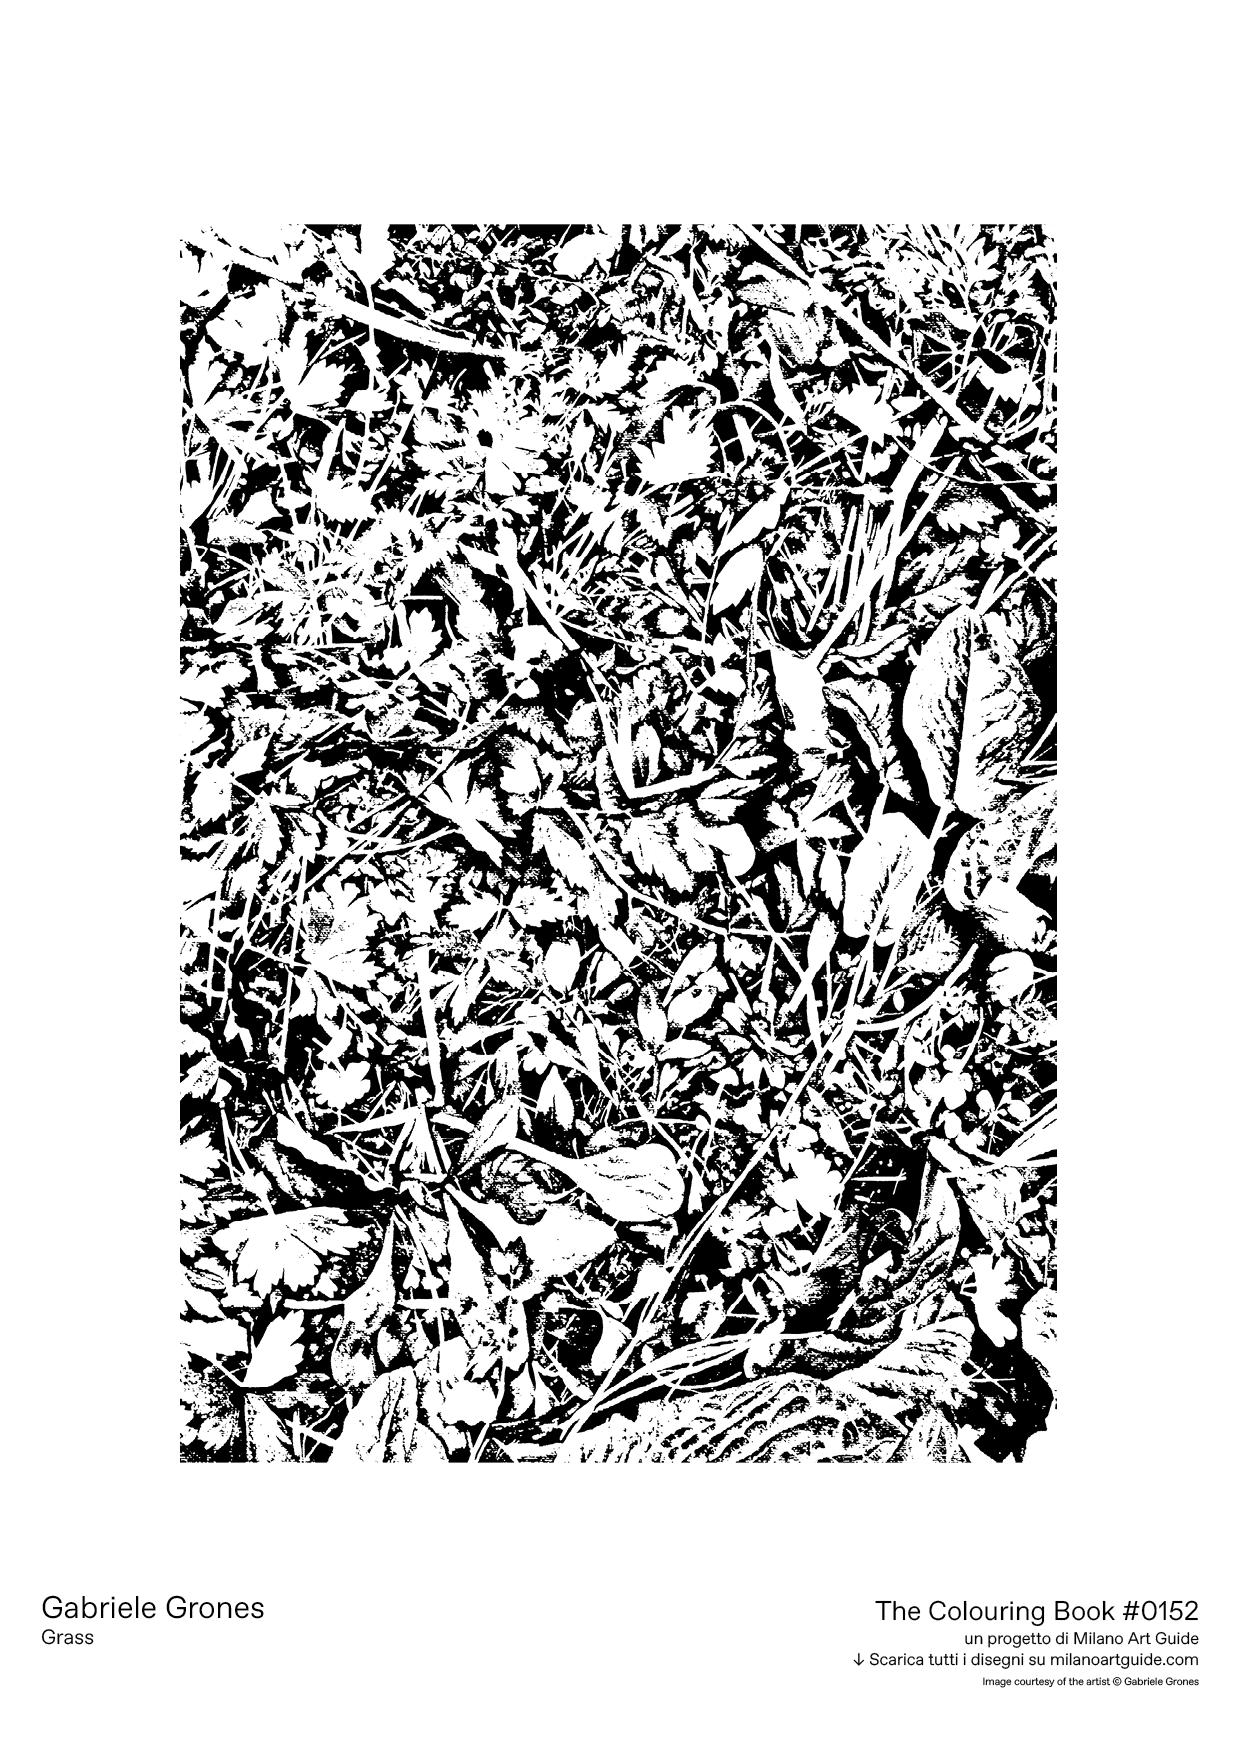 0152_GabrieleGrones_Grass_THECOLOURINGBOOK_MILANOARTGUIDE.jpg